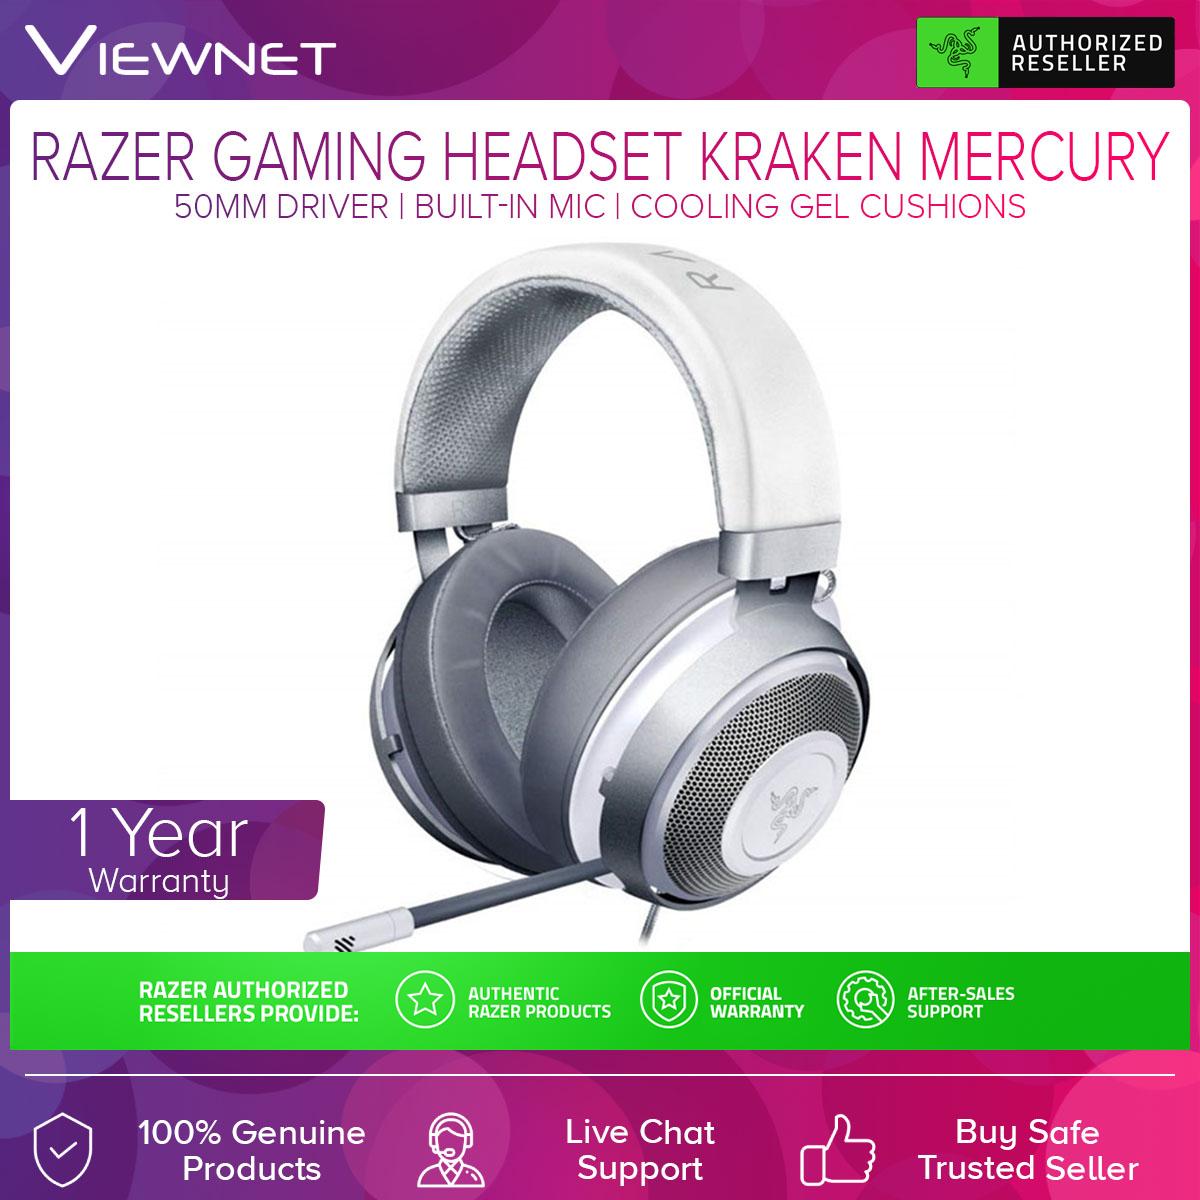 Razer Kraken Gaming Headset Gaming 2.1 (RZ04-02830300-R3M1 / RZ04-02830400-R3M1)  (Quartz / Mercury) with 50MM Driver, Colling Gel Cushions, Aluminum Frame, Thicker Headband Padding, Built-In Mic, Cross-Platform Compatibility